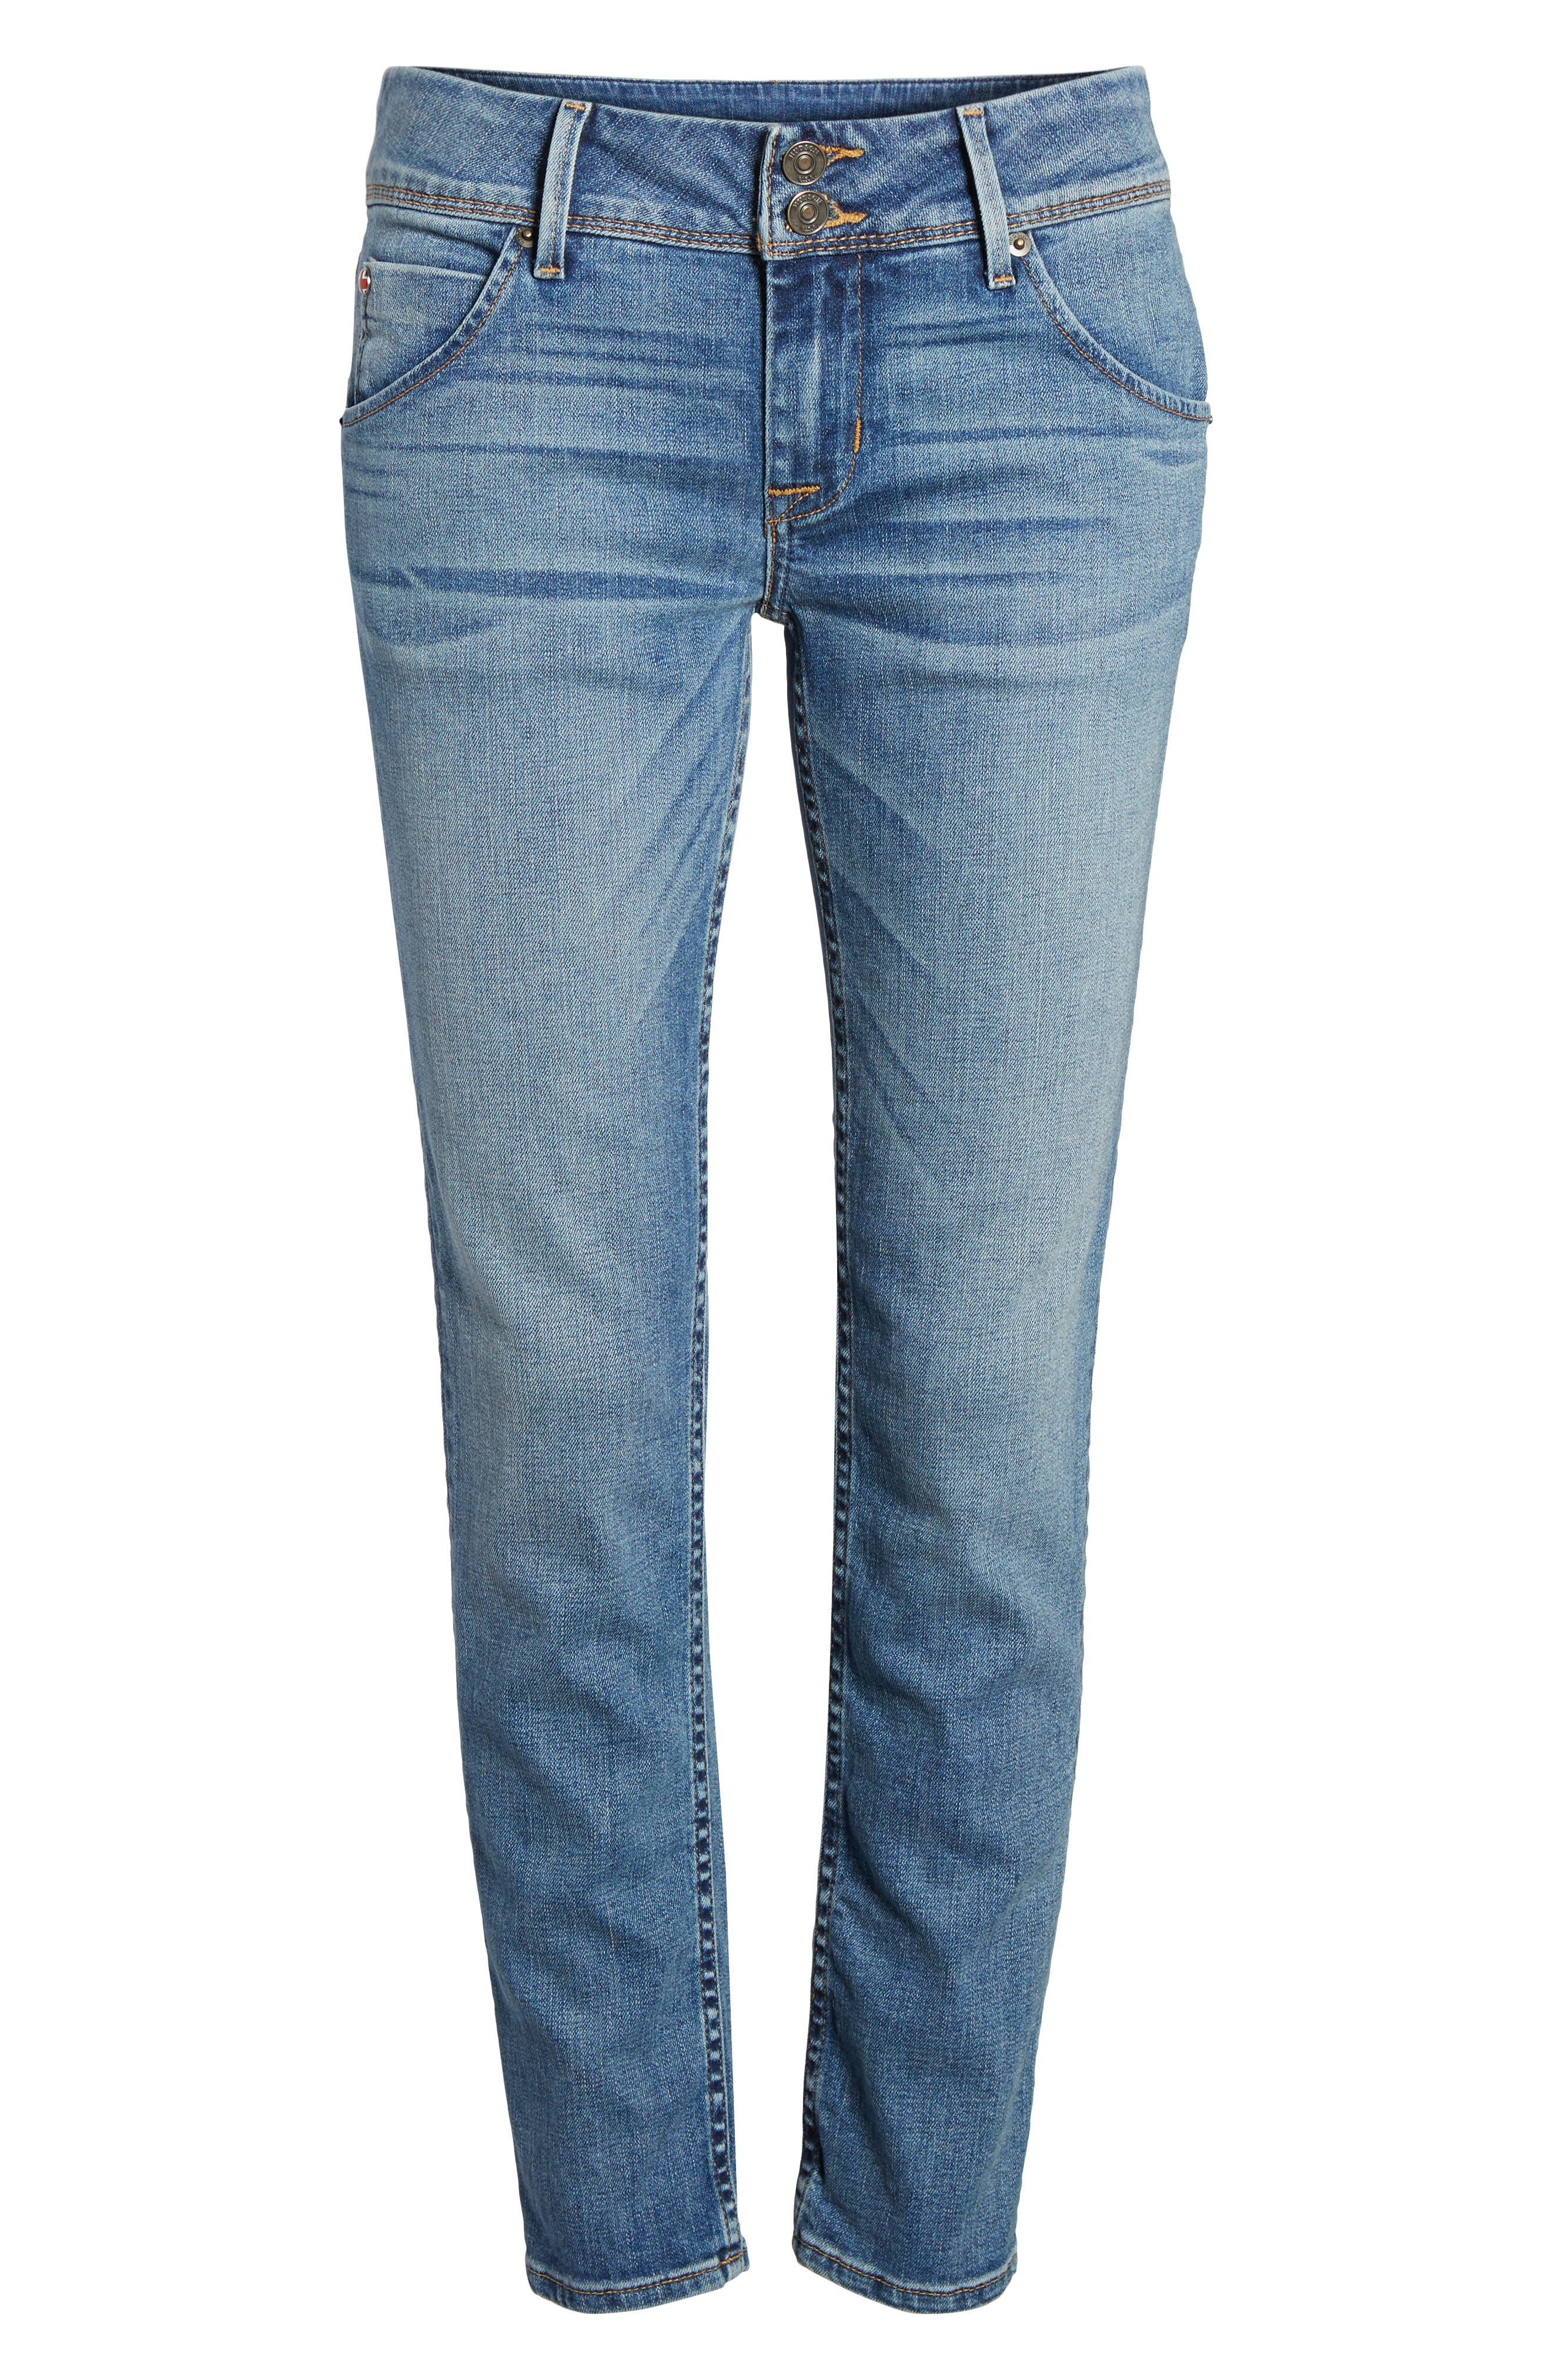 Hudson Collin Skinny Jeans,                             Alternate thumbnail 7, color,                             Hushed